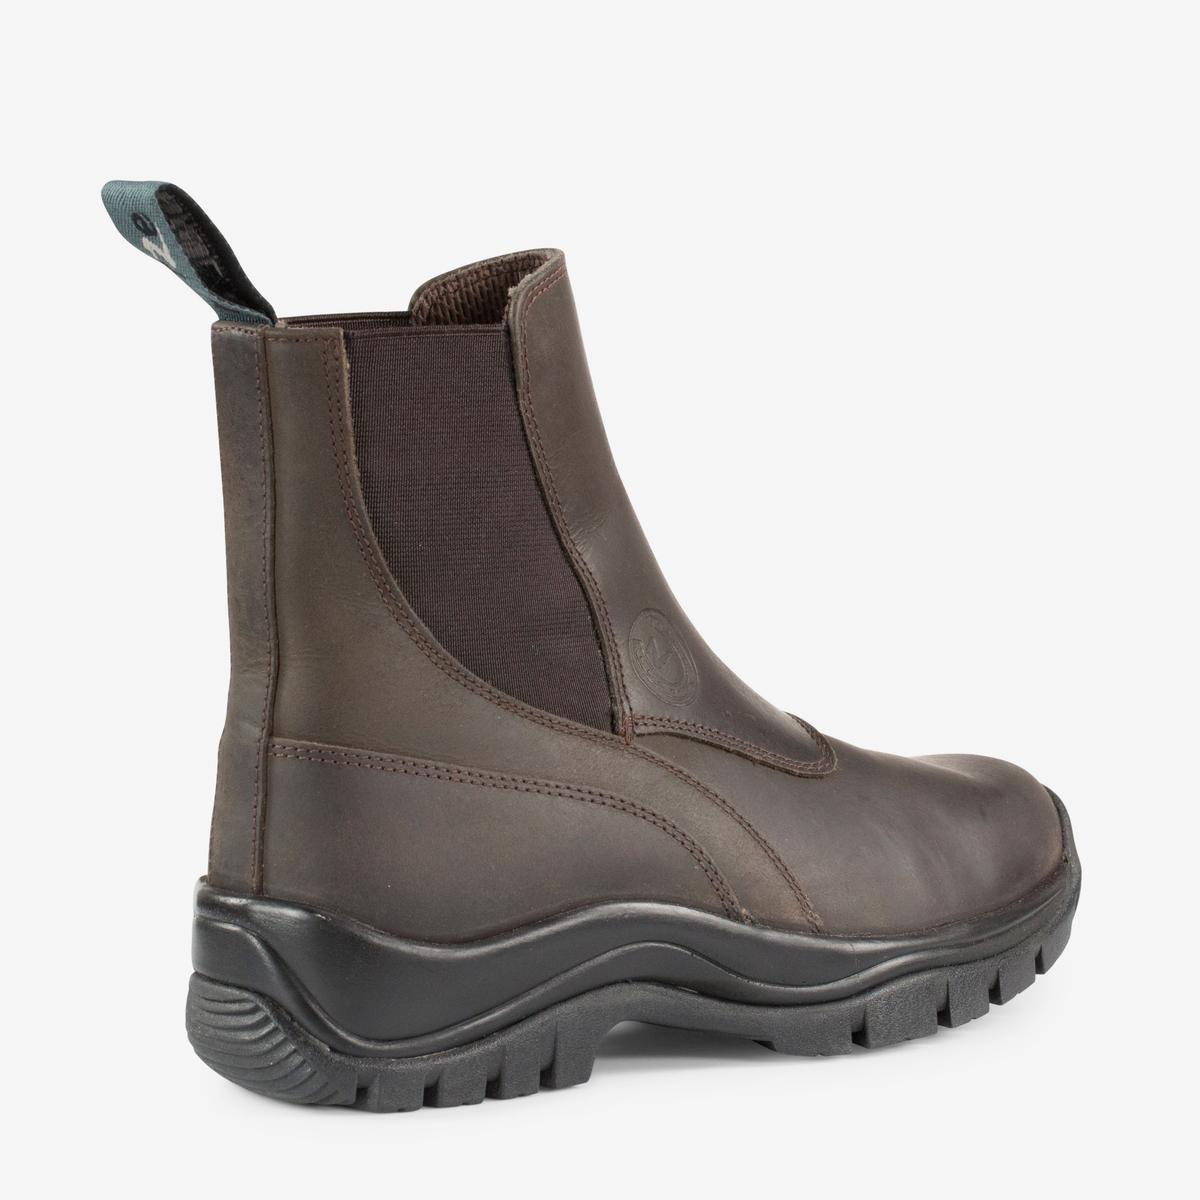 a51bc9619ca8 Horze Sporty Jodhpur Boots